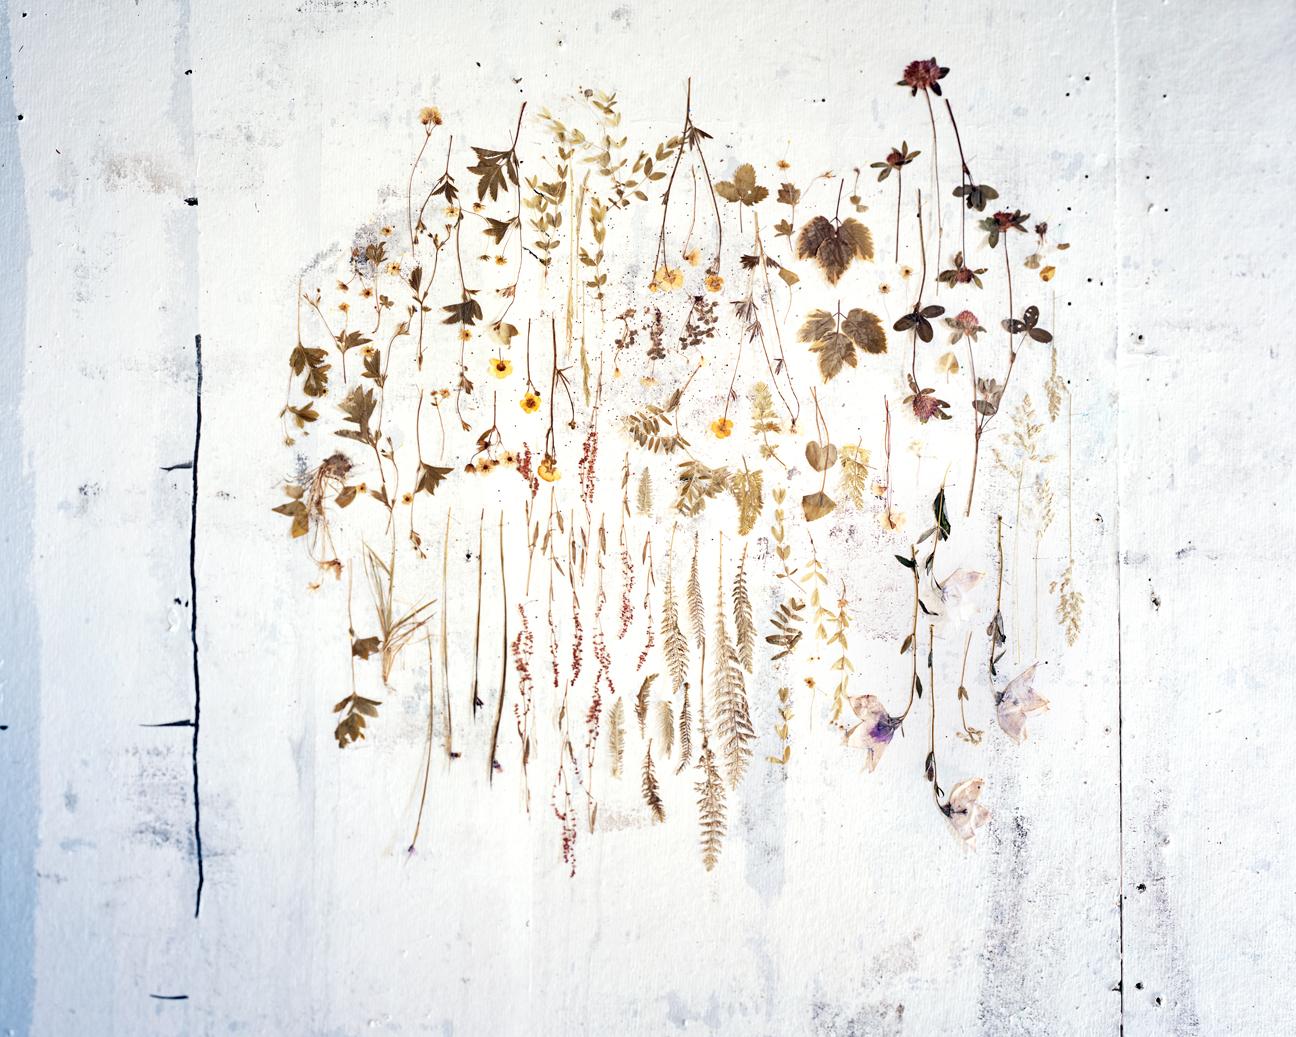 Pressed Flowers 1978-2013